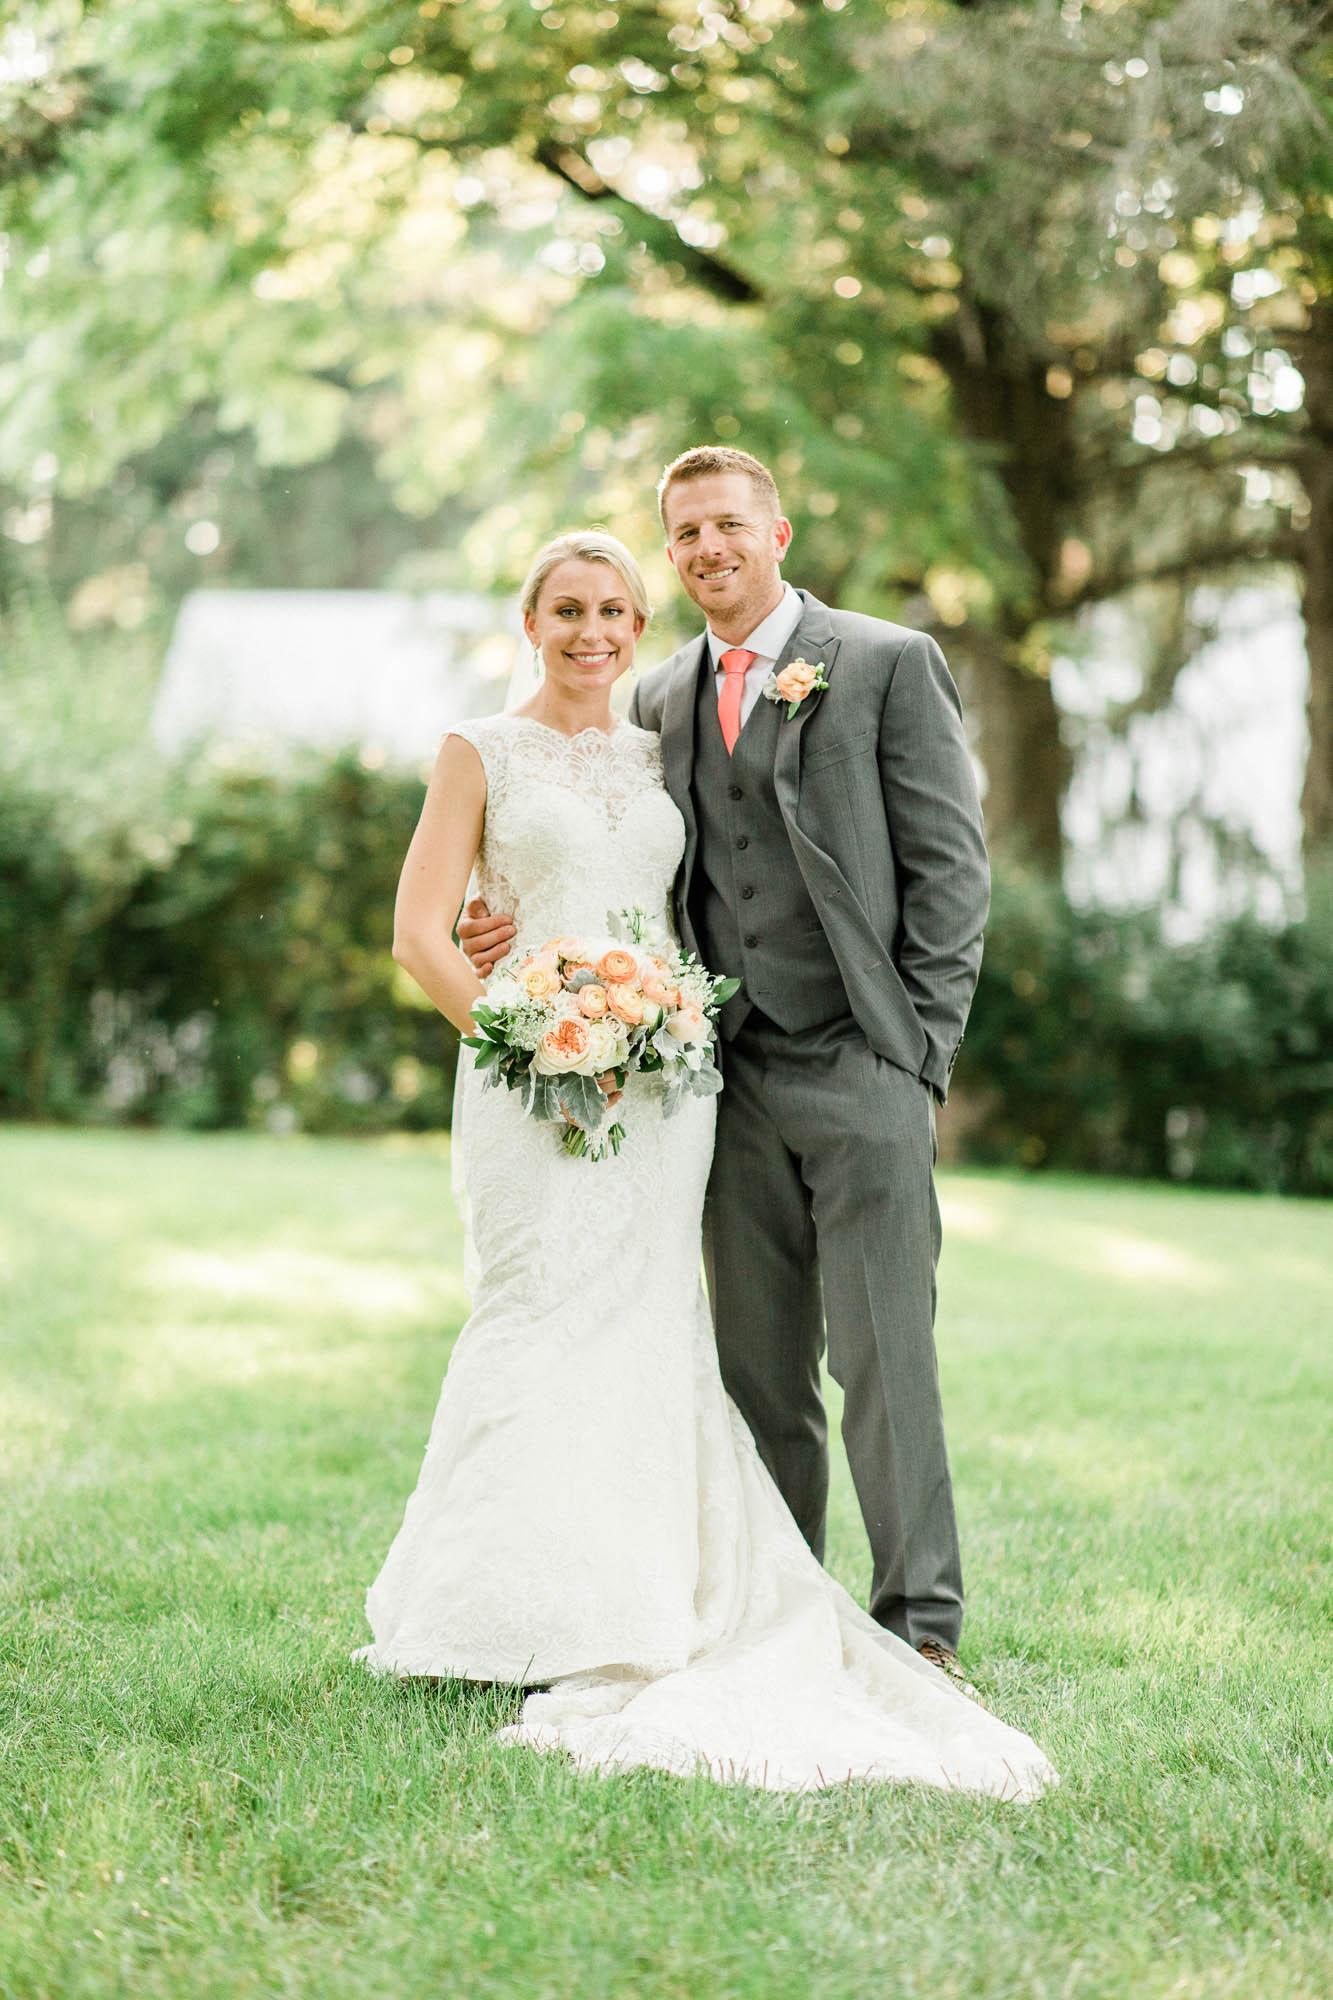 Allenberry-resort-historic-pennsylvania-wedding-22325.jpg